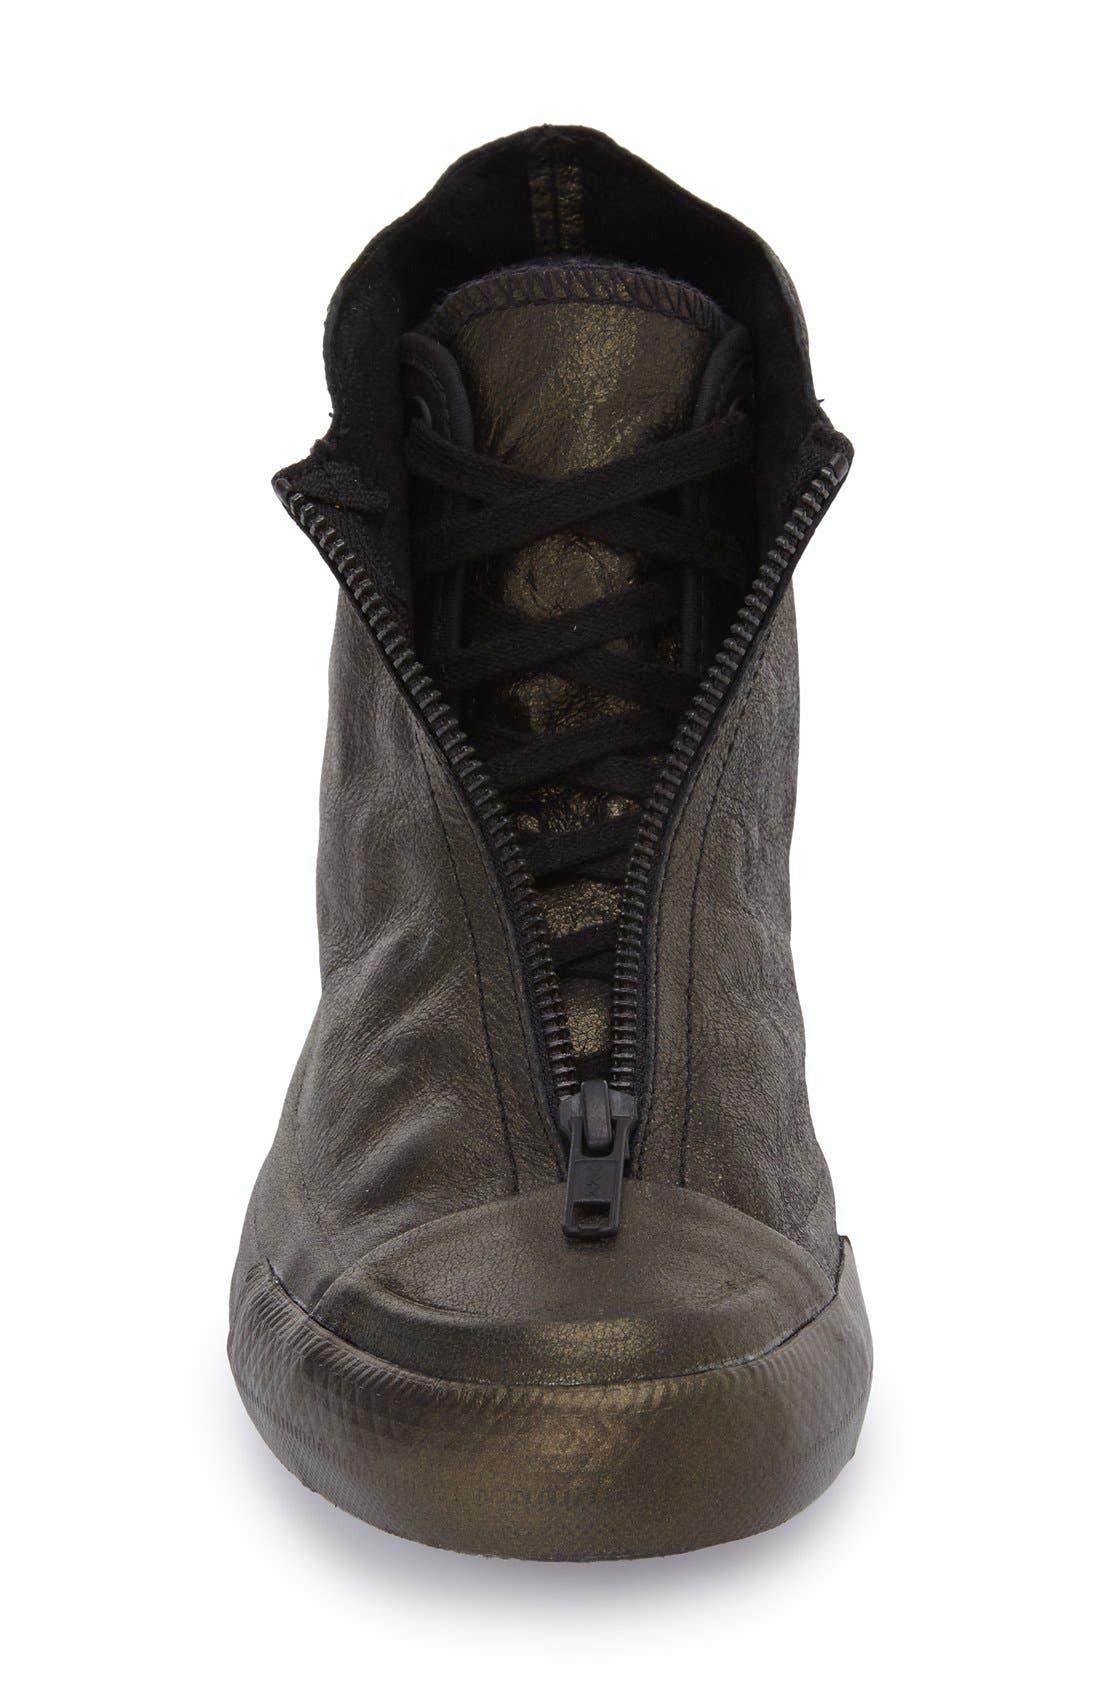 CONVERSE,                             Chuck Taylor<sup>®</sup> All Star<sup>®</sup> 'Shroud' Metallic High Top Sneaker,                             Alternate thumbnail 3, color,                             017